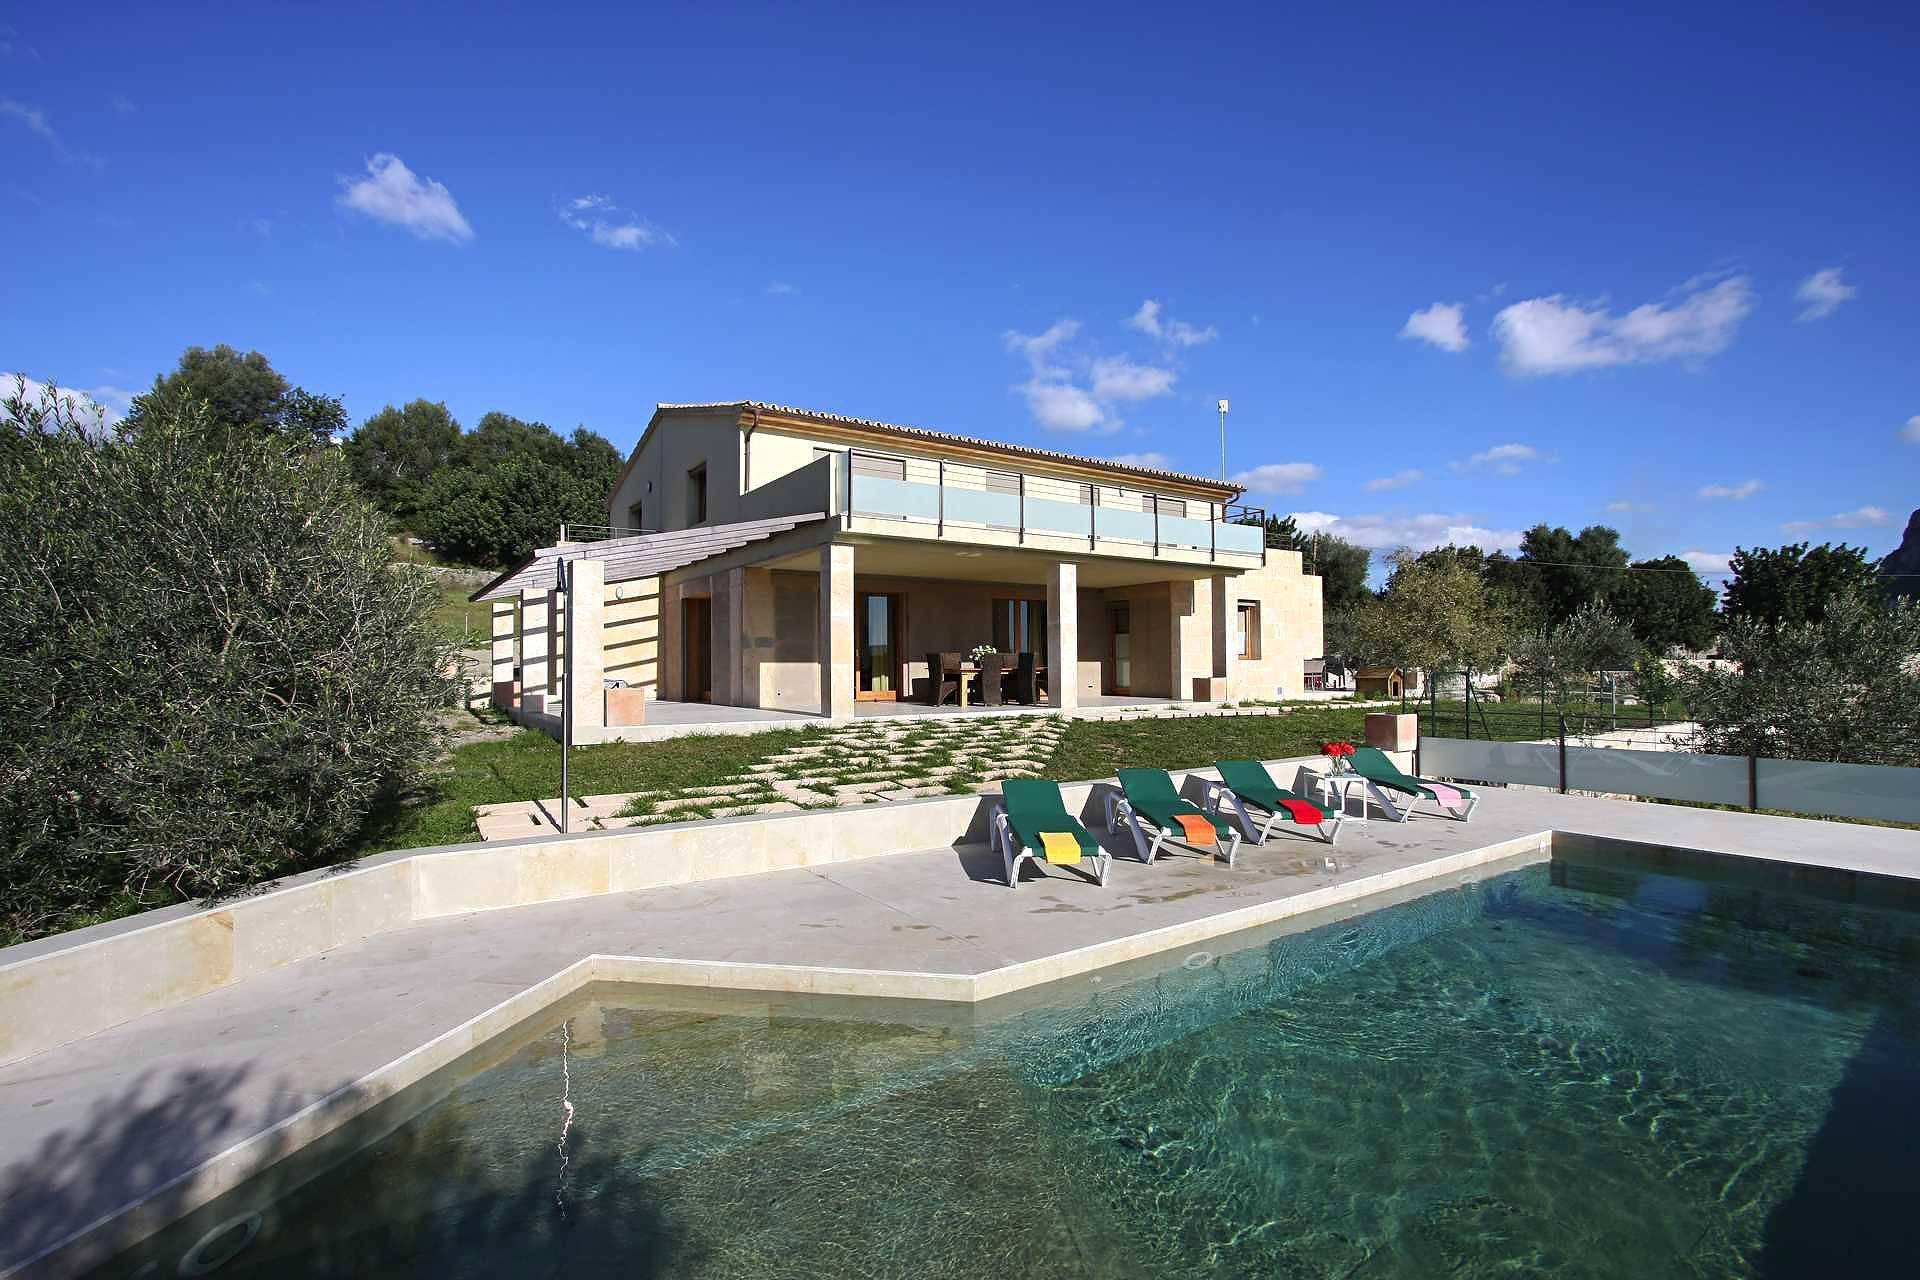 01-36 klassische Villa Mallorca Norden Bild 1